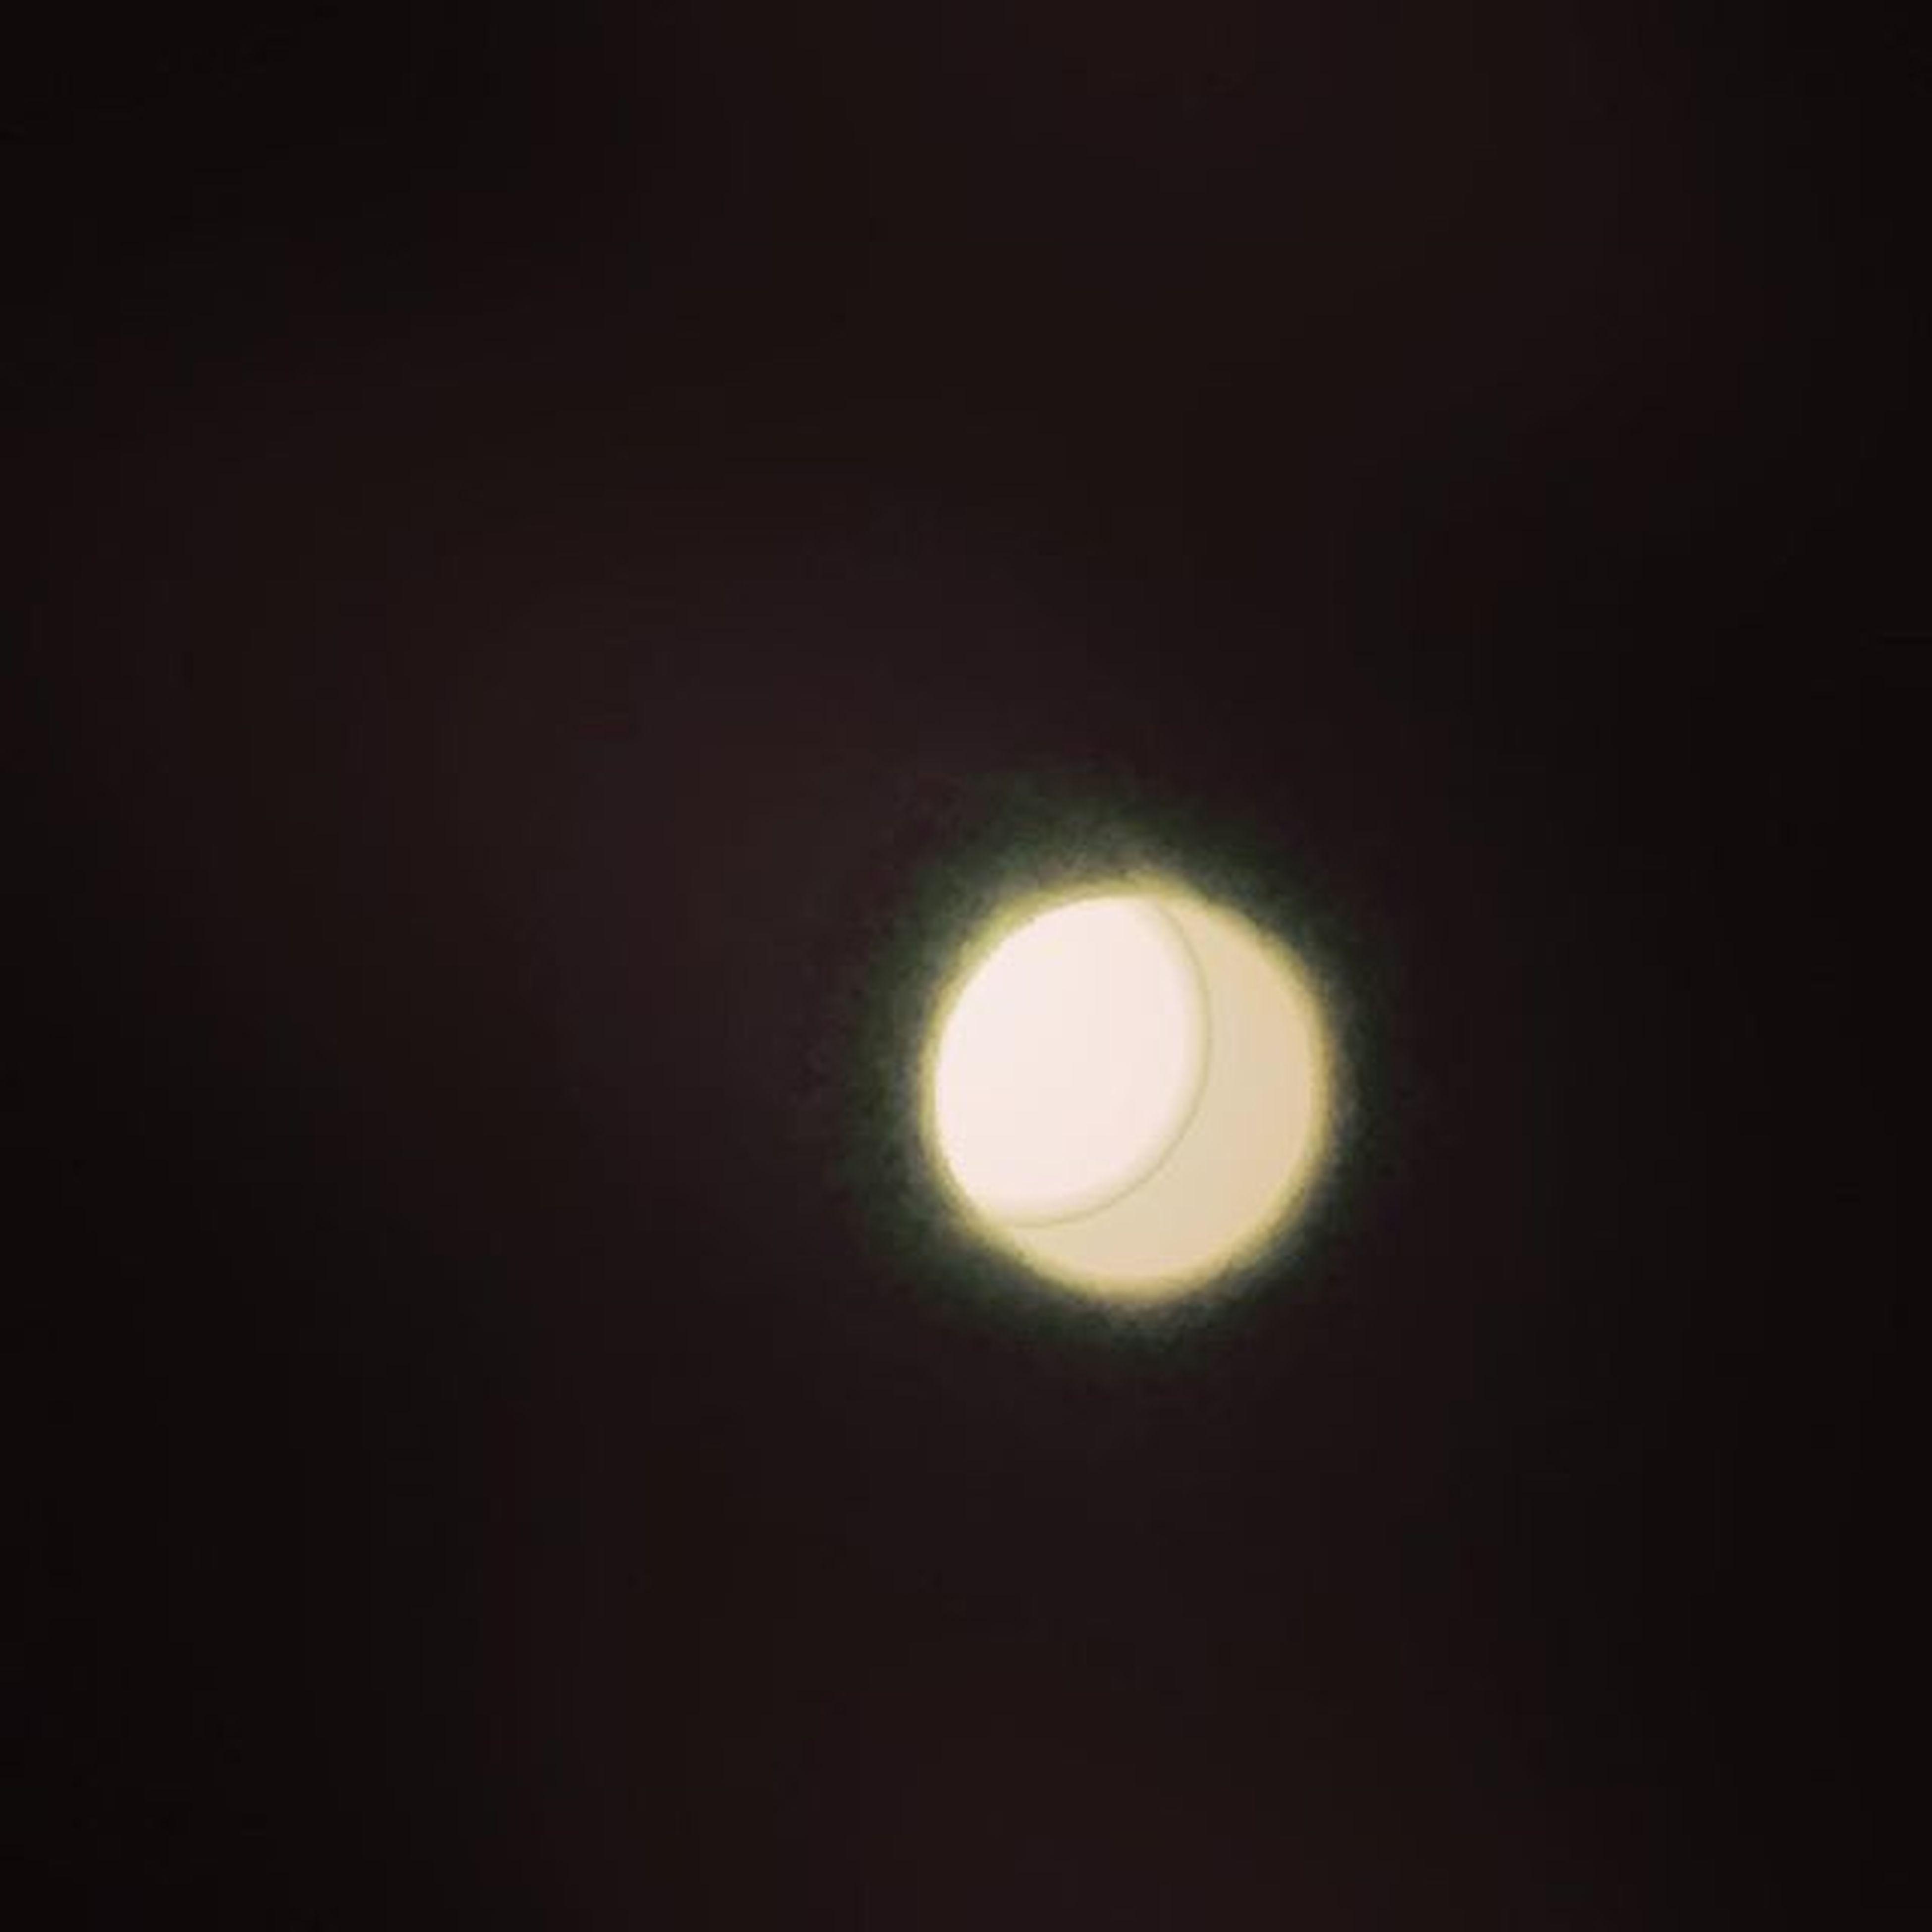 Strange fullmoon tonight... Esbat Moon Fullmoon Pagan Goddess Motheroflife Darksky Noclouds Wtfhappenedtoyoumoon ??